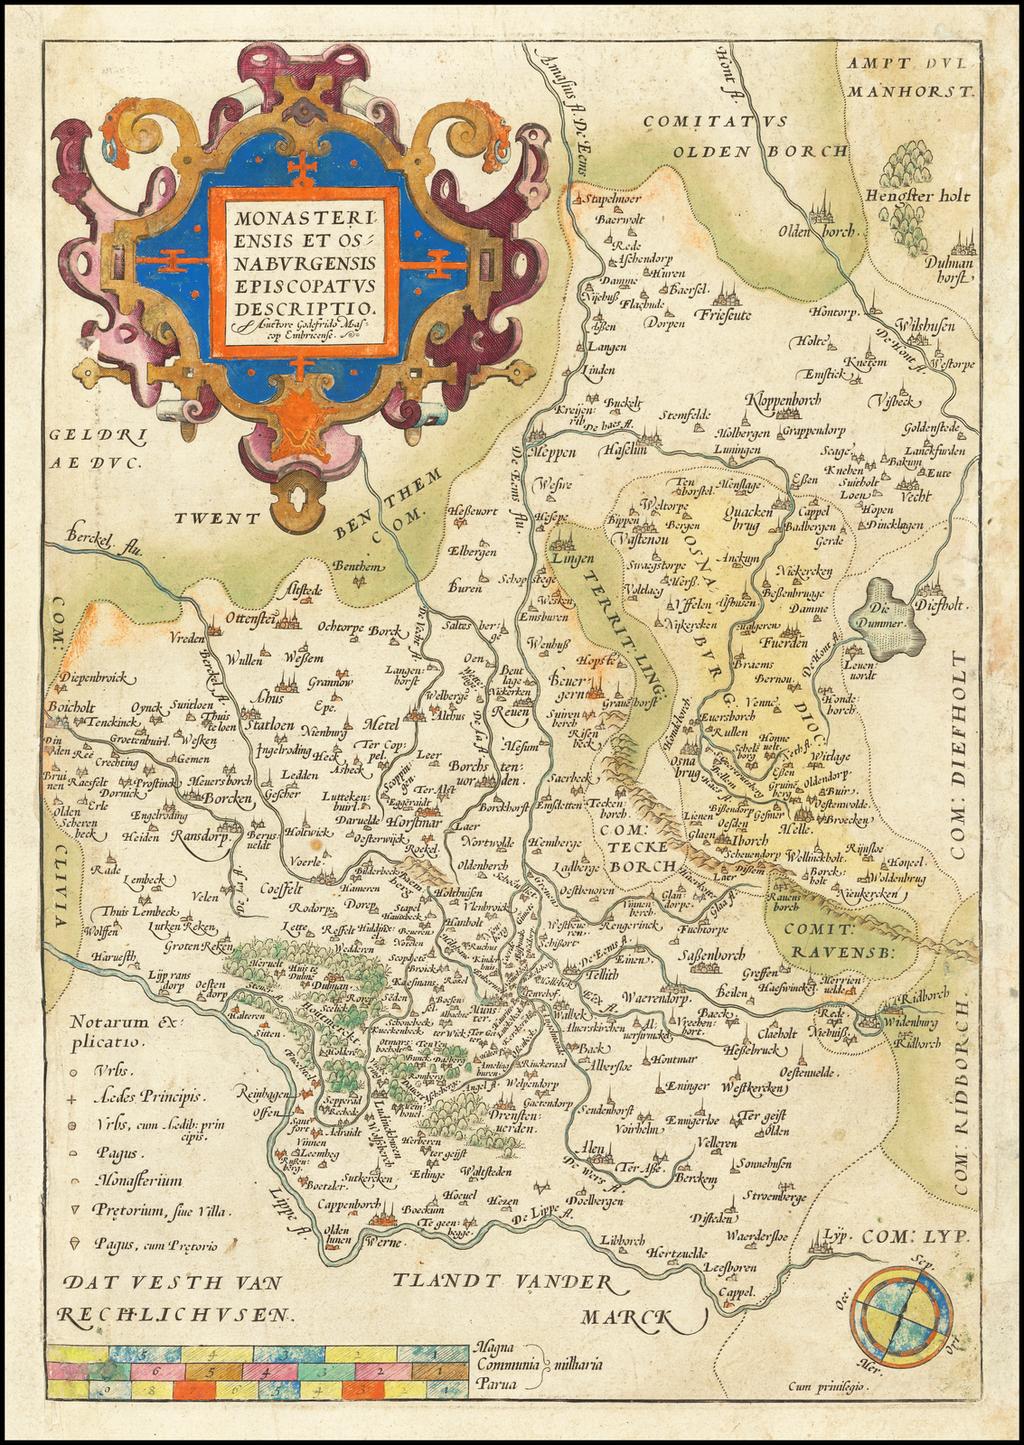 Monasteriensis Et Osnaburgensis Episcopatus Descriptio By Abraham Ortelius